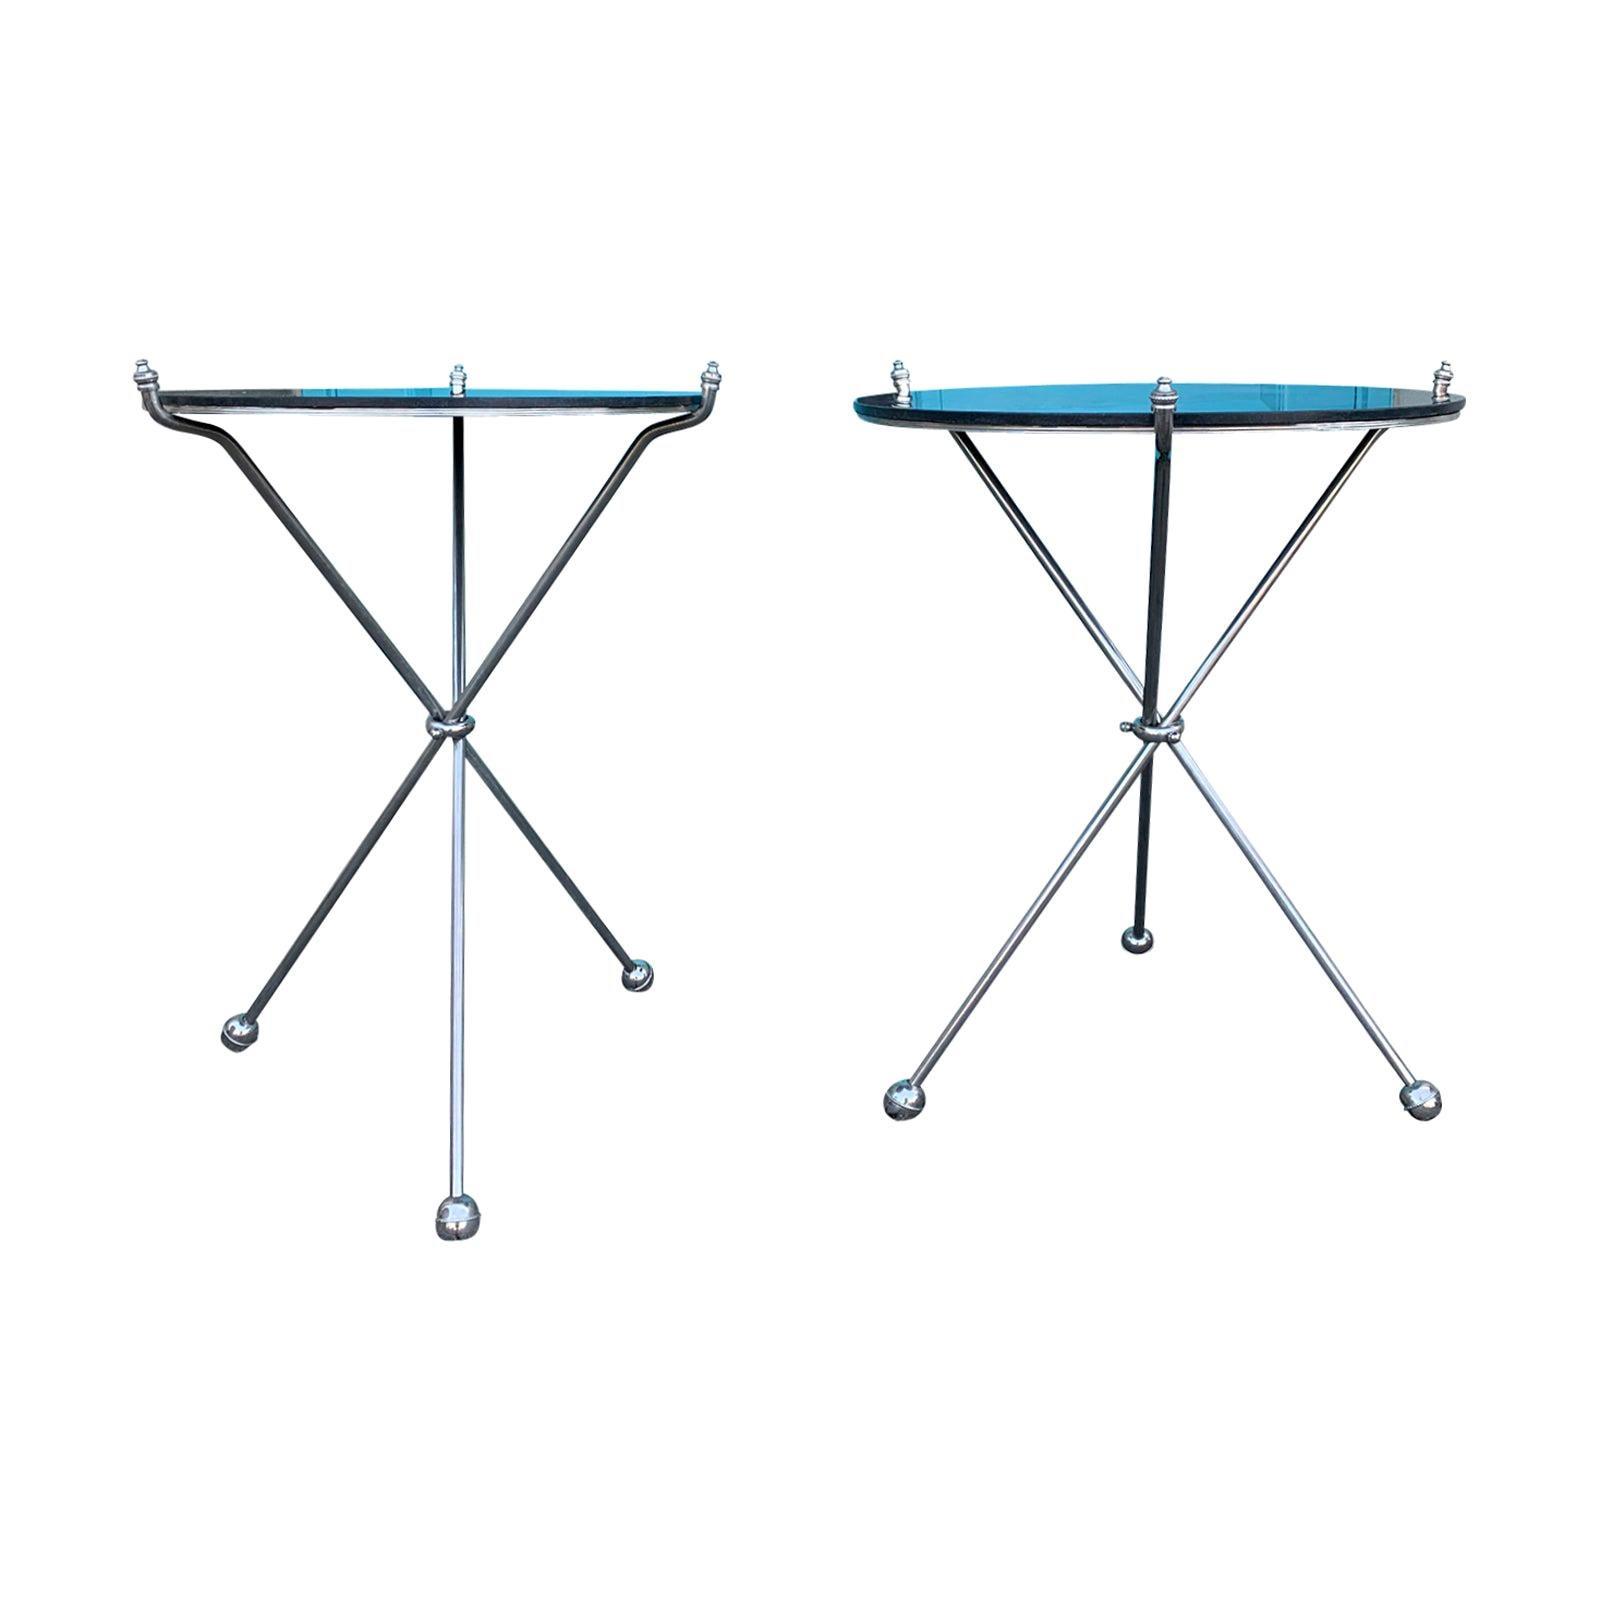 Pair of Maison Jansen Style Italian Steel Folding Tripod Tables with Marble Tops